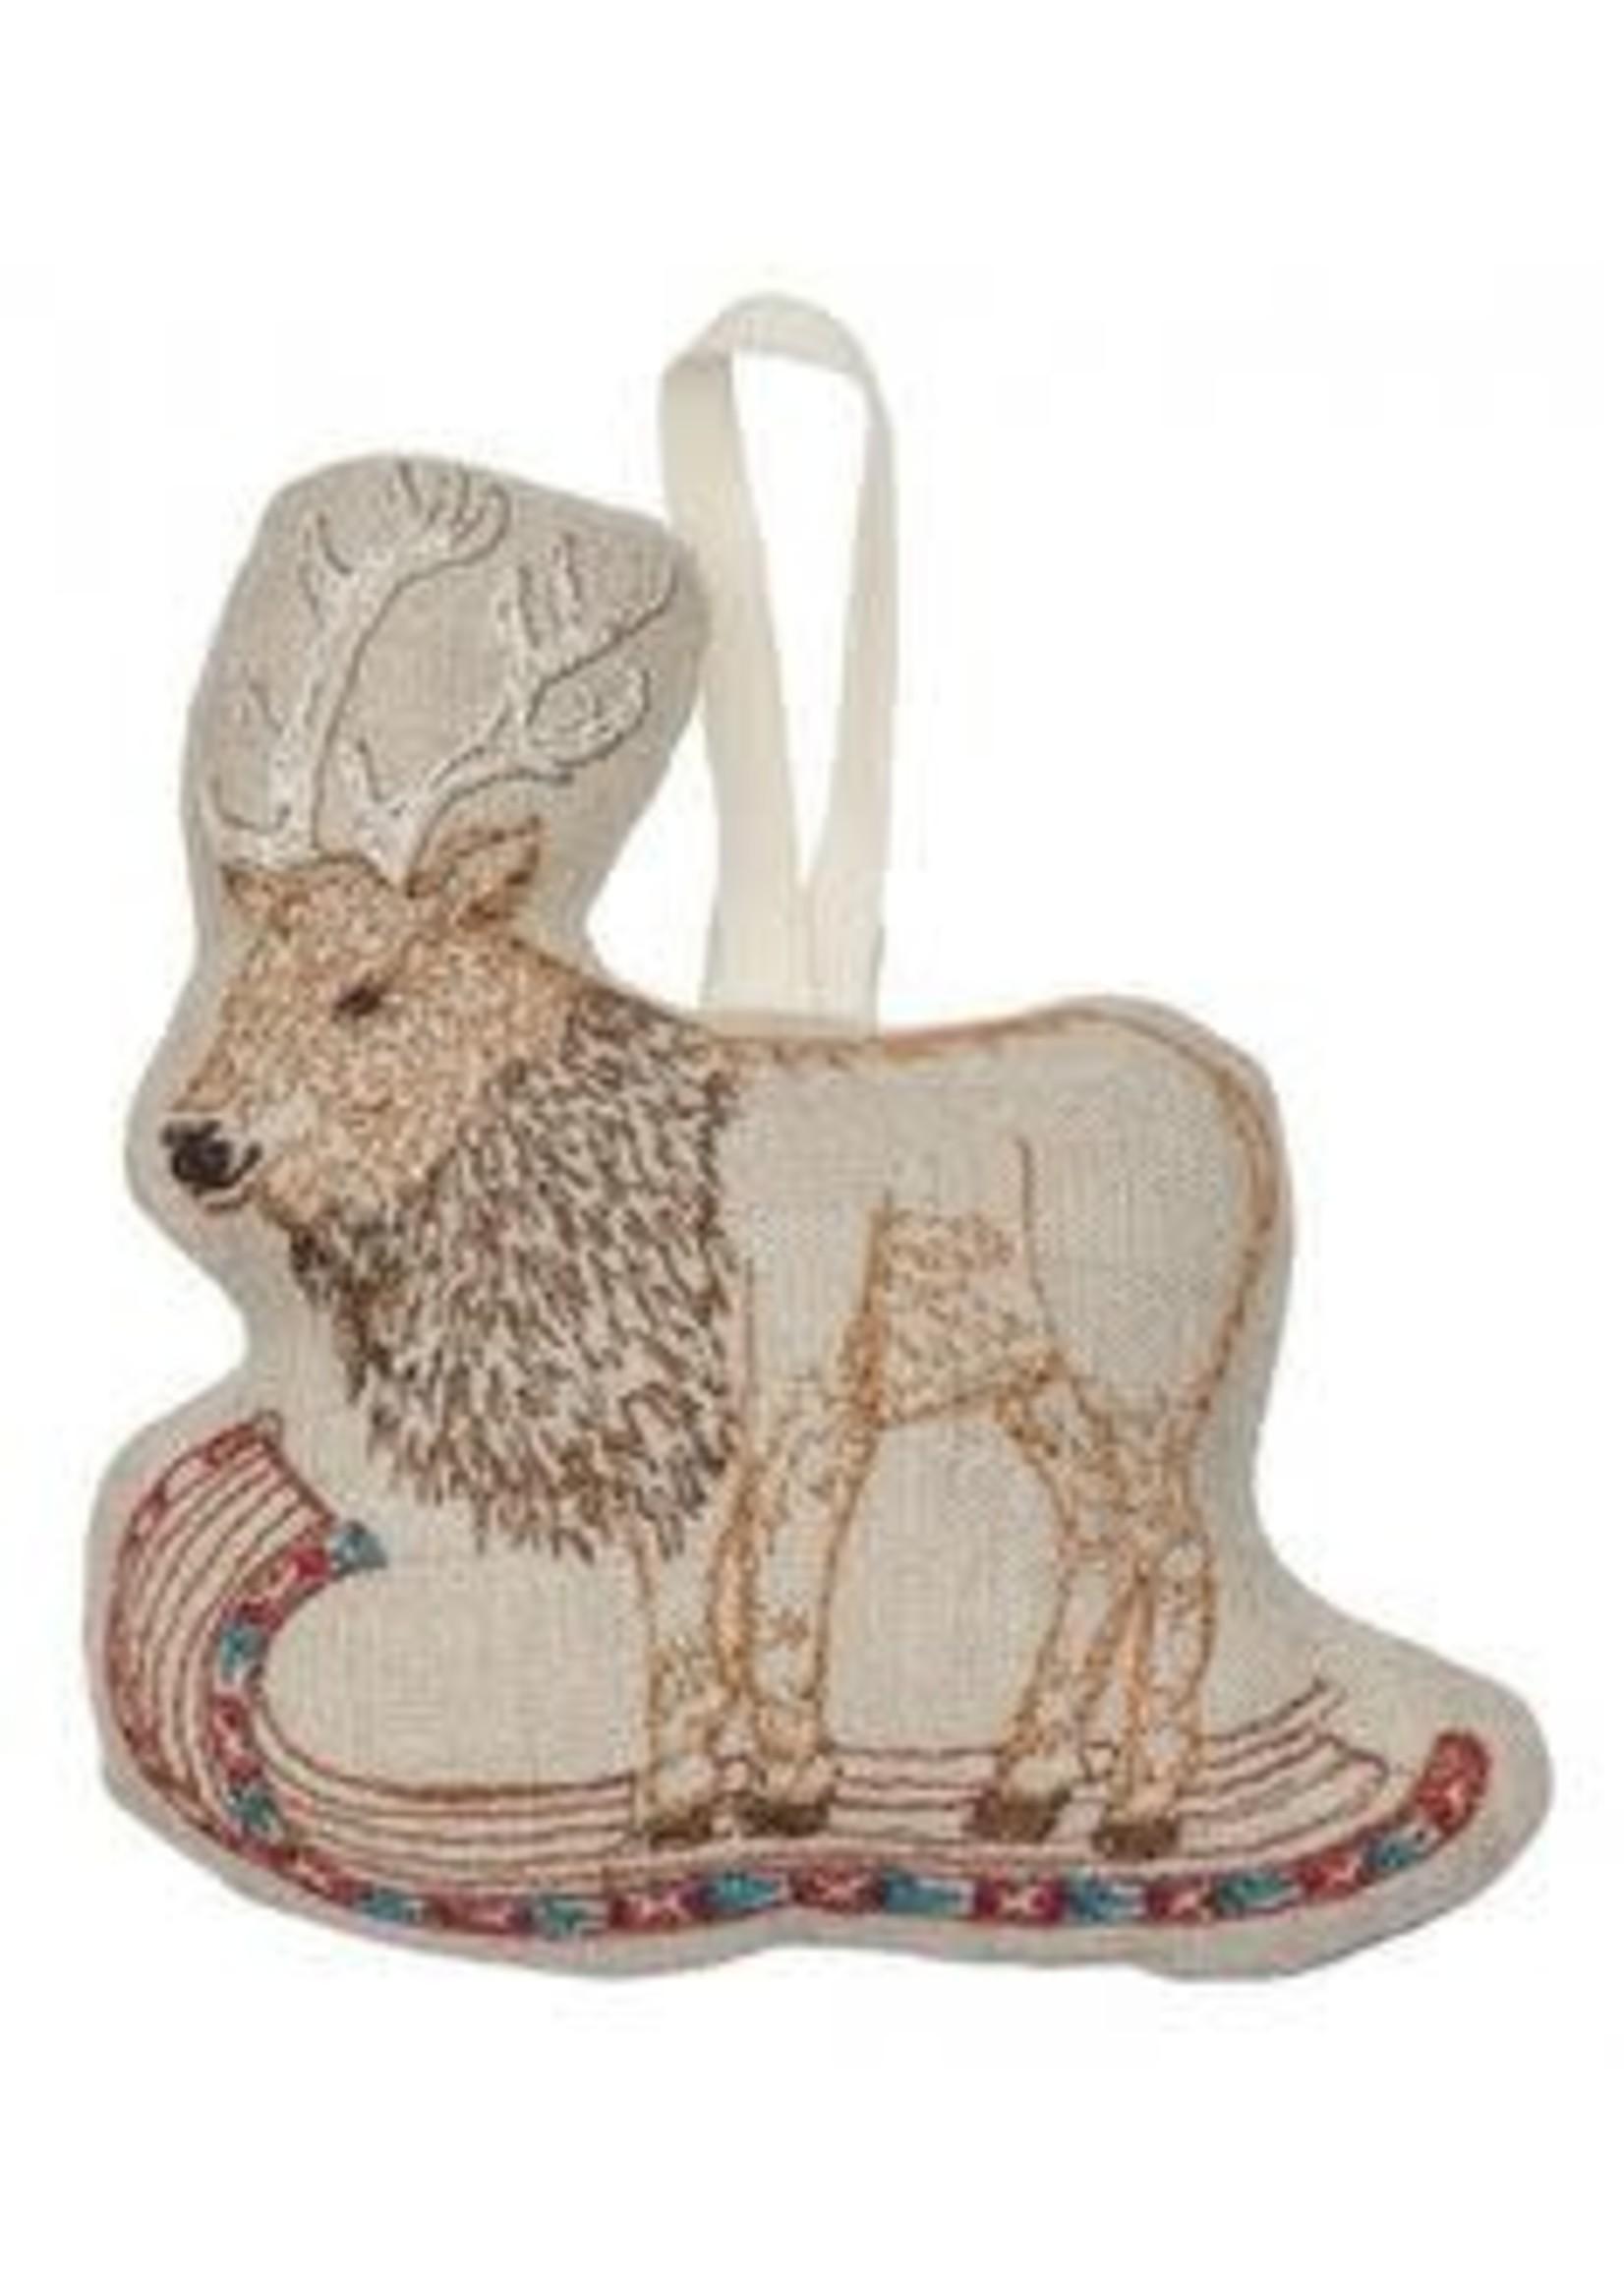 Coral and Tusk Ornament - Elk on Toboggan